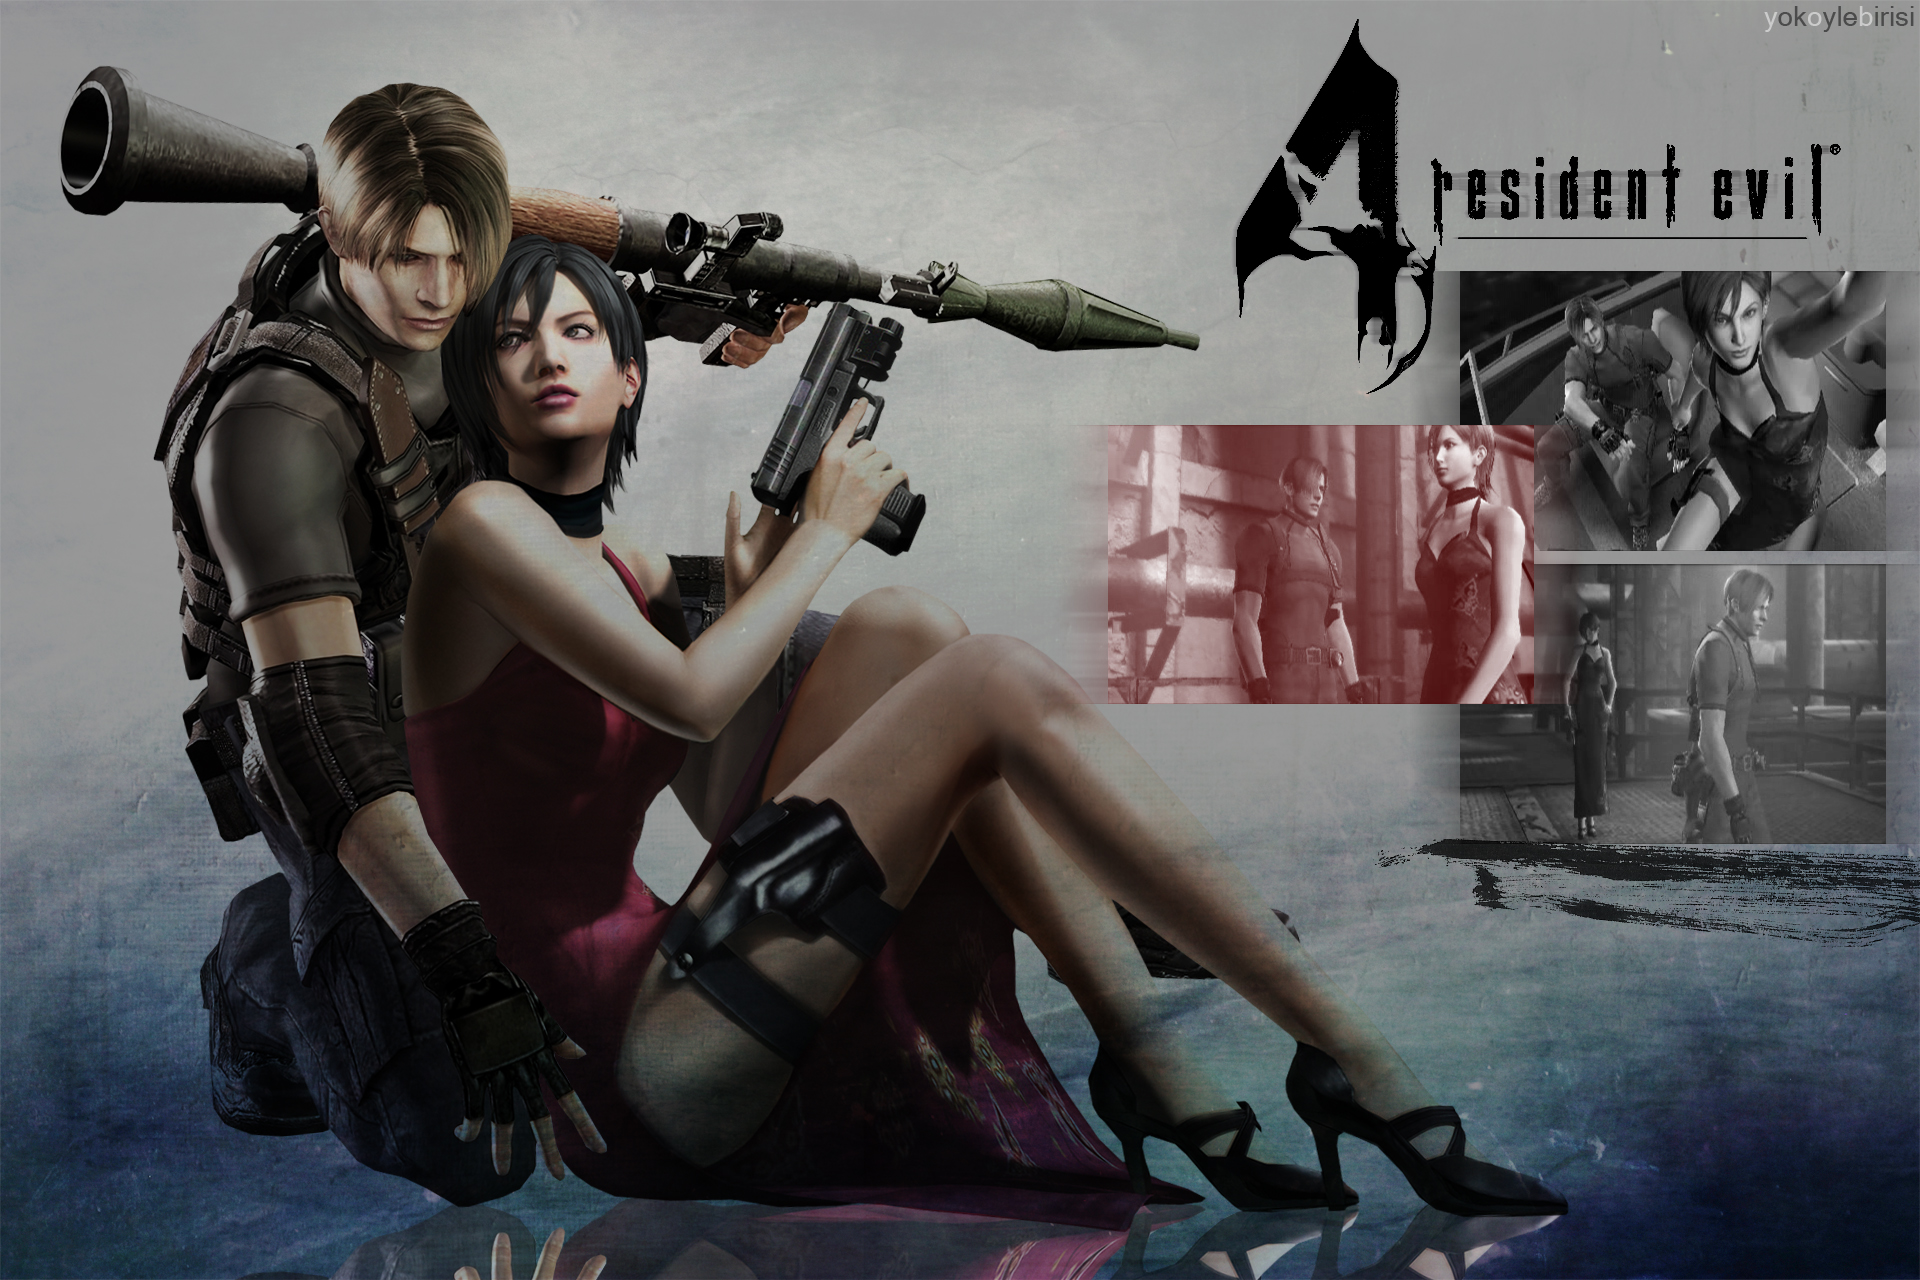 Resident Evil 4 Ada Leon Wallpaper 11 By Yokoylebirisi On Deviantart